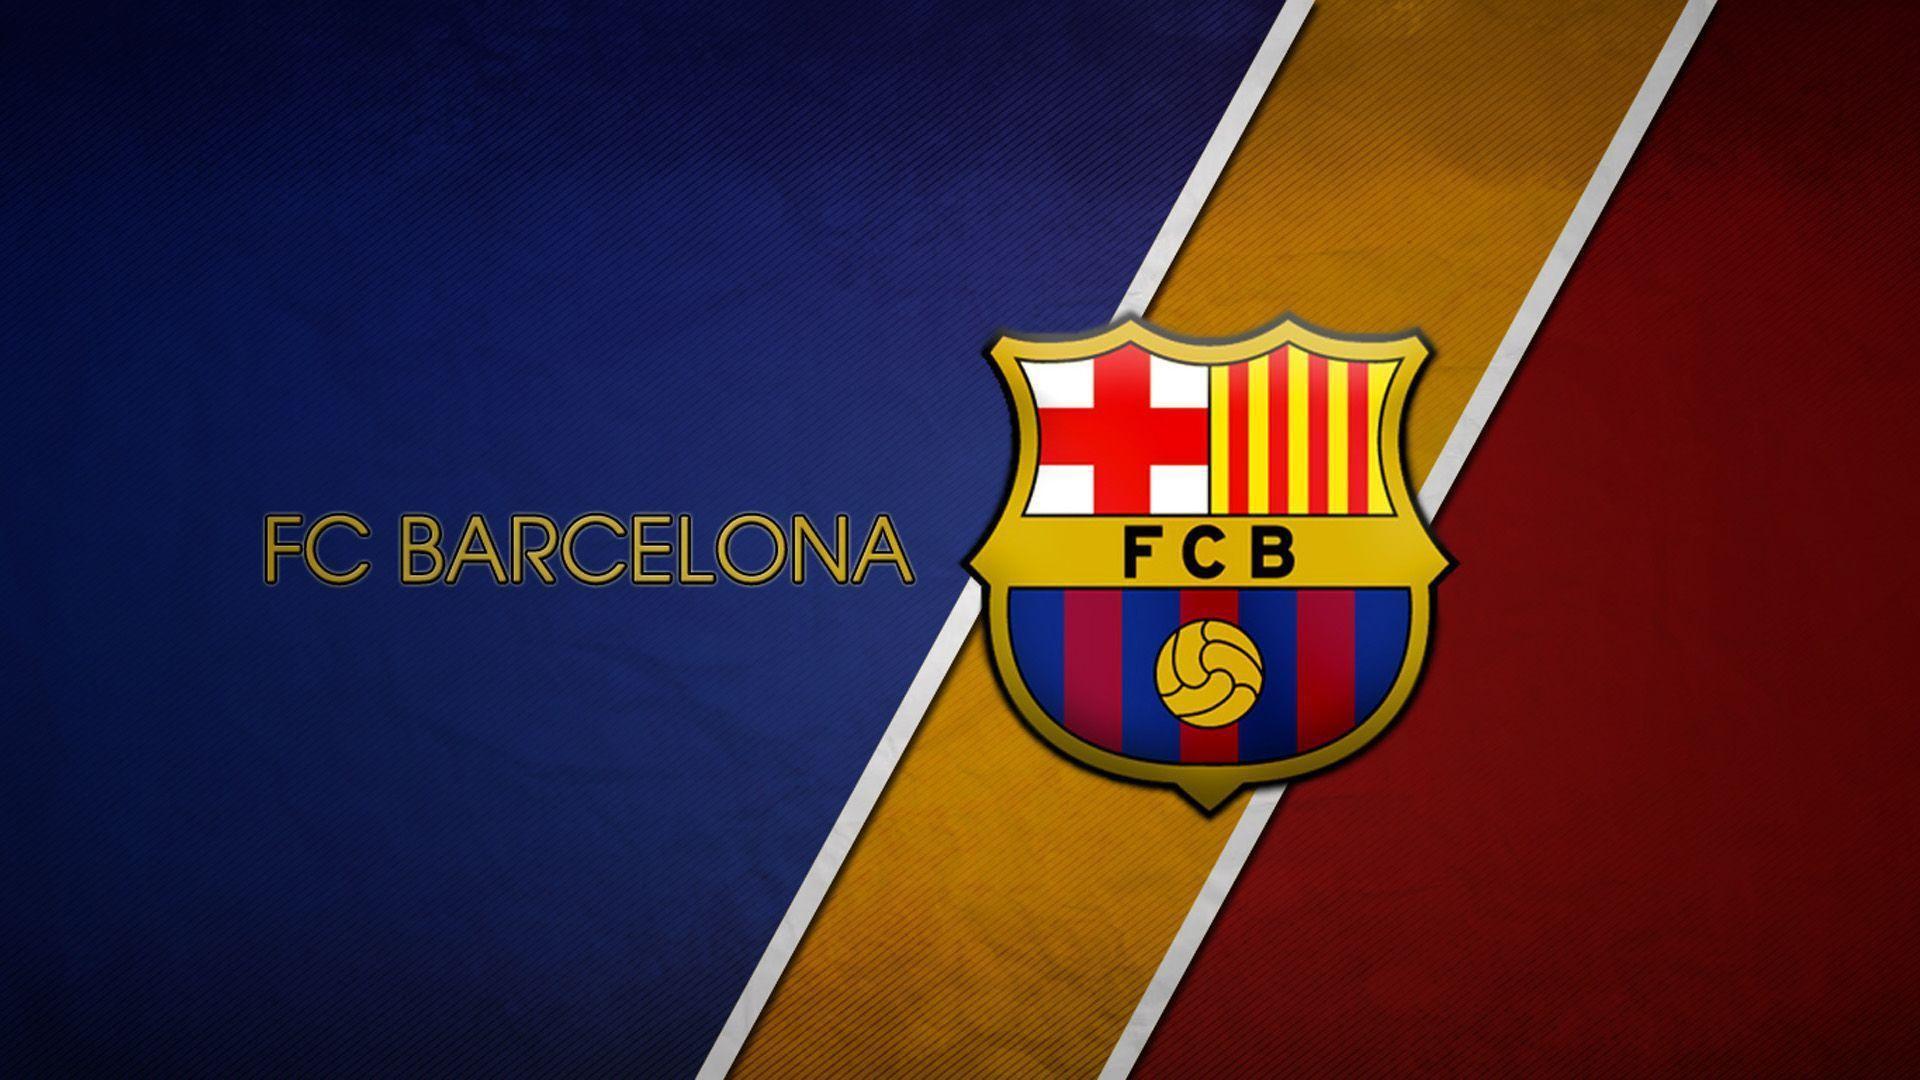 FC Barcelona Wallpapers 2016 - Wallpaper Cave